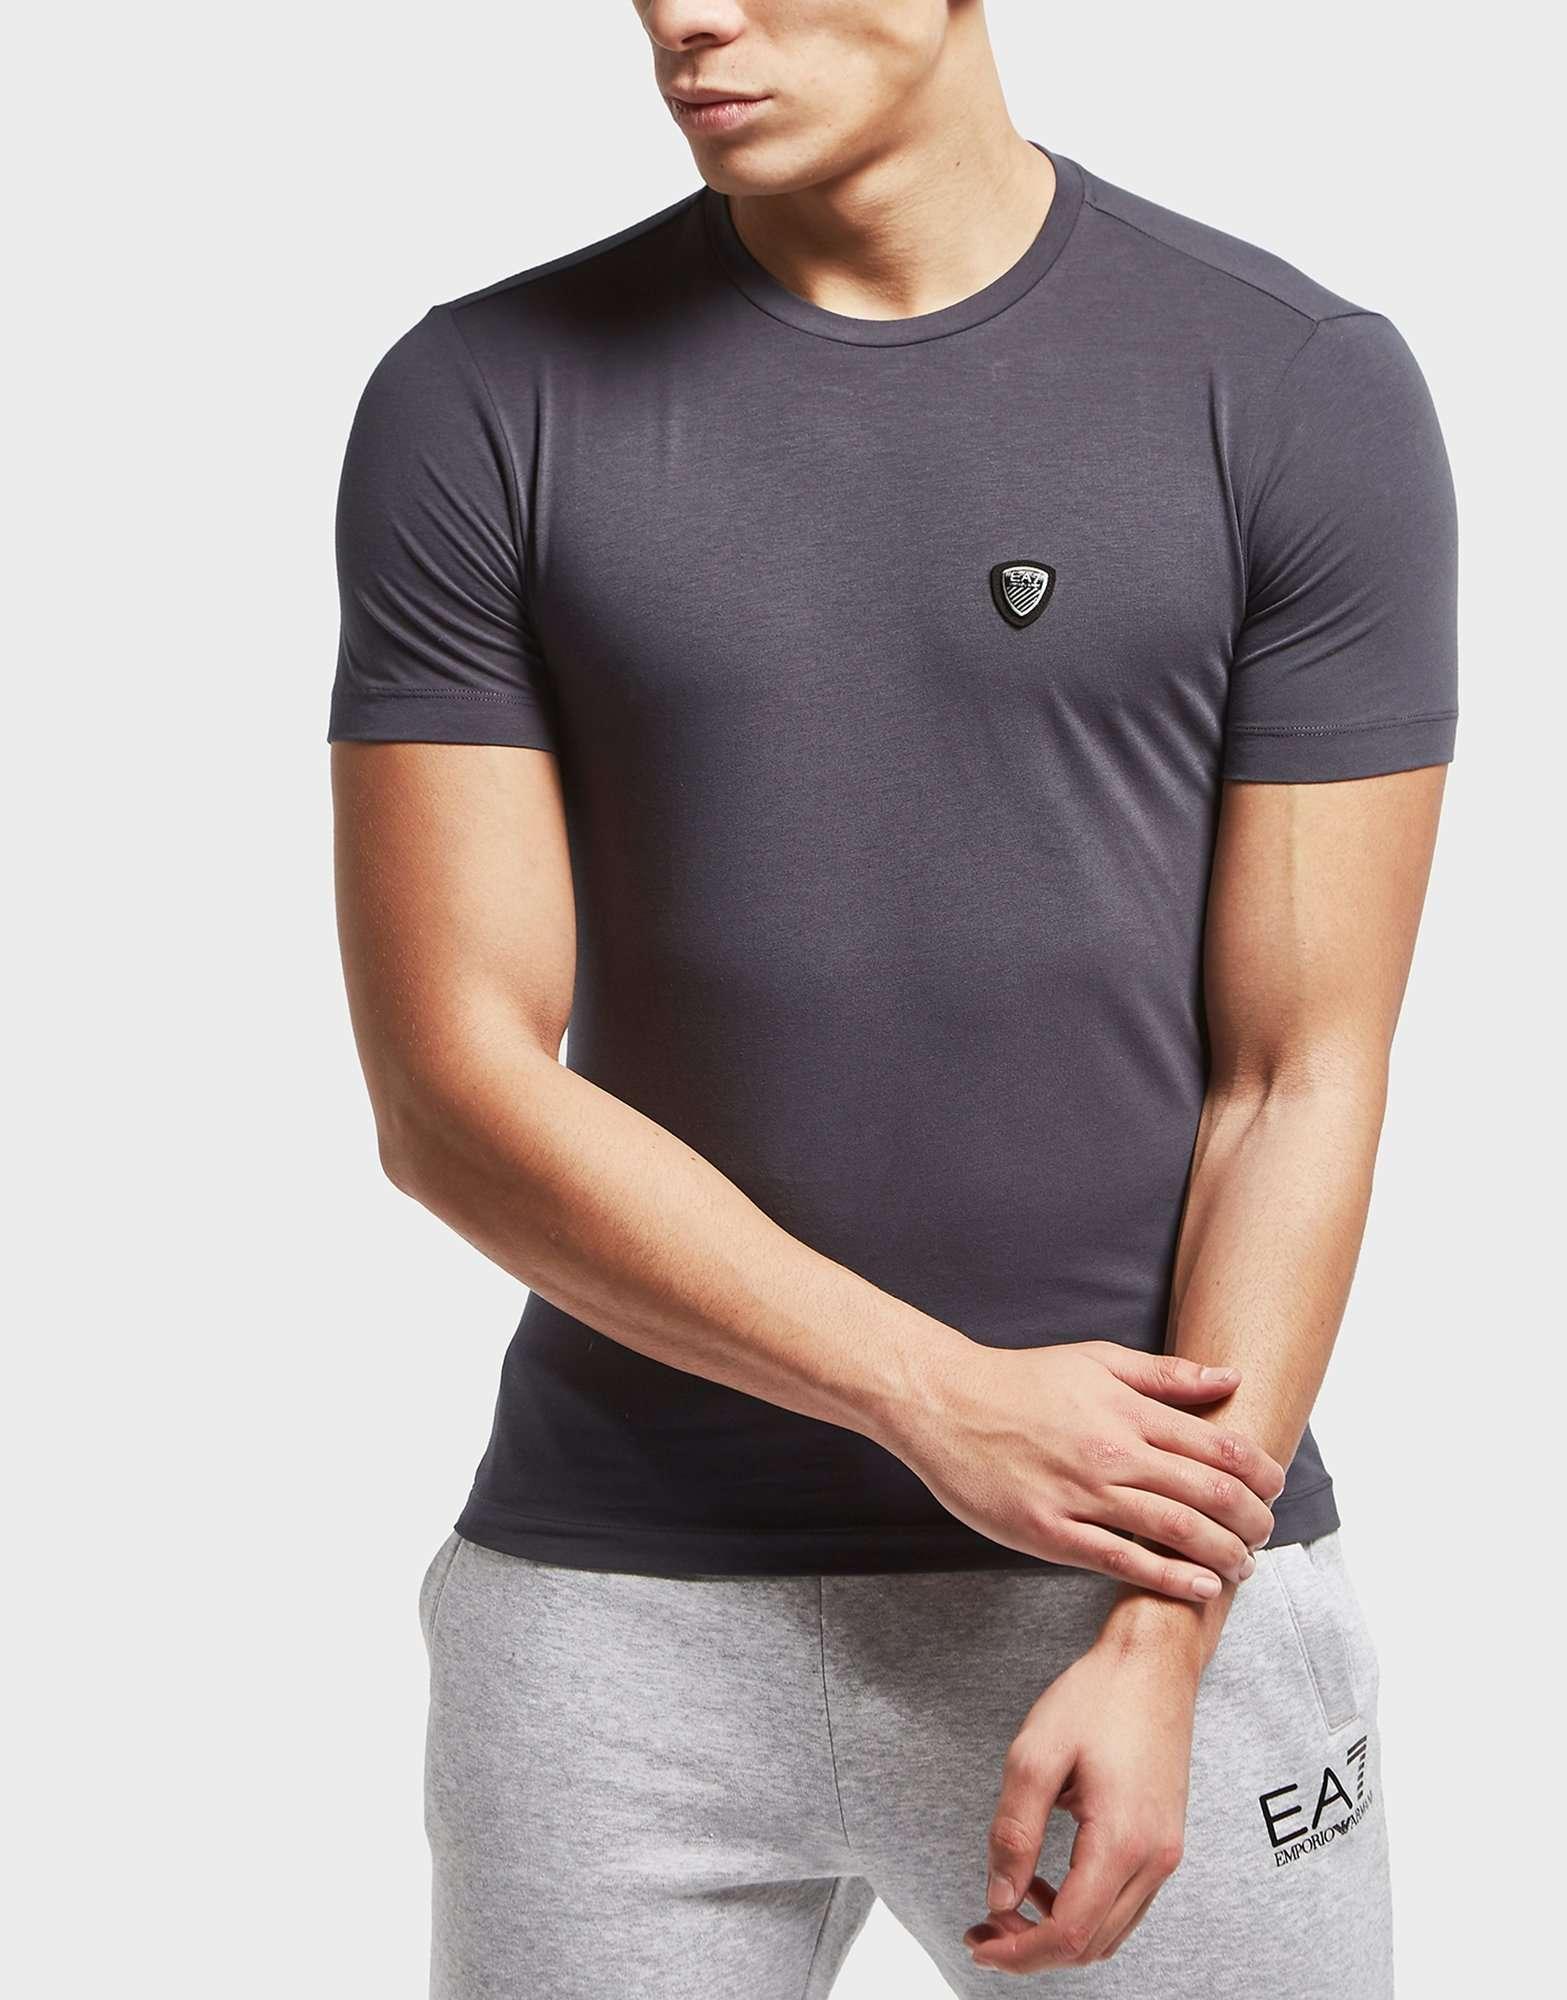 Emporio Armani EA7 Shield Logo Short Sleeve T-Shirt